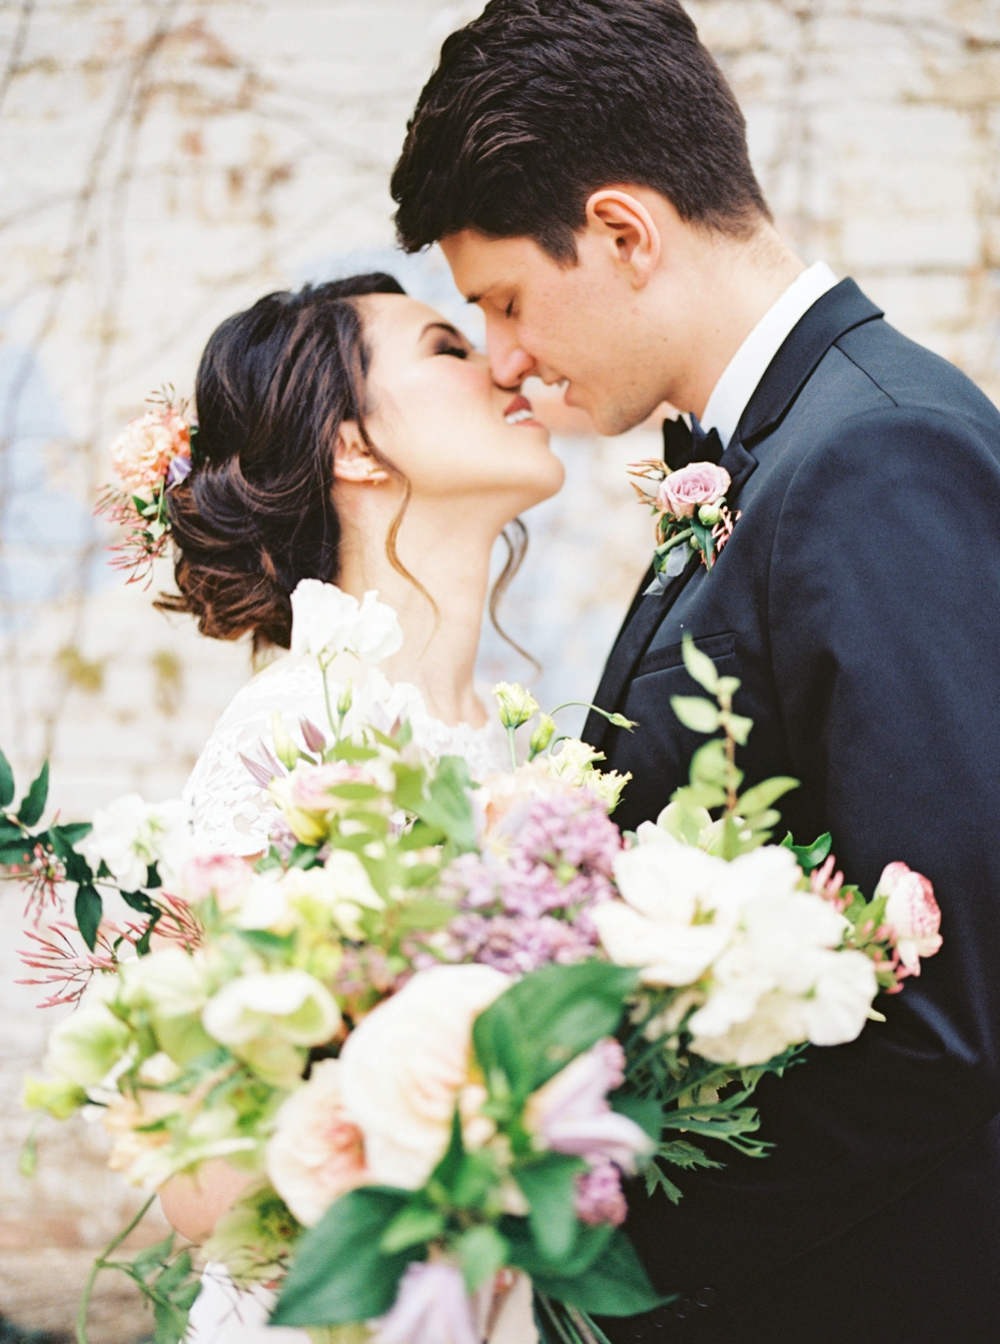 Fort Worth Wedding Planner Lindsey Zamora at Brik Venue